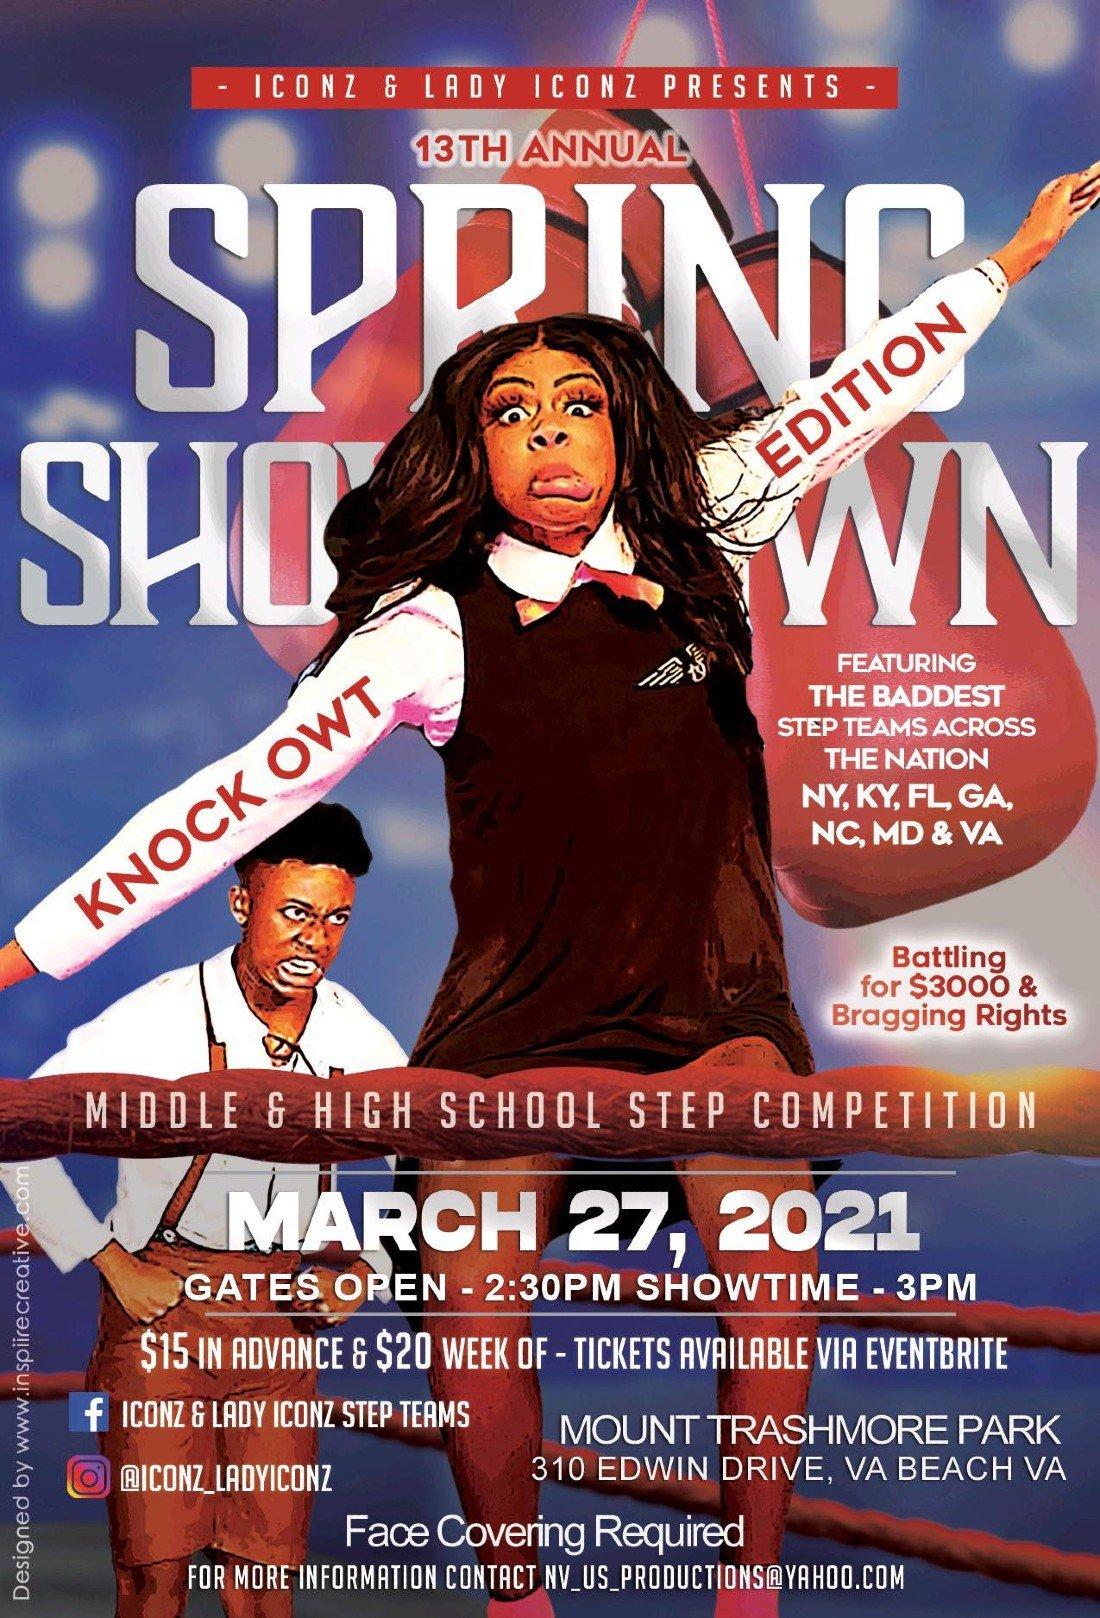 Spring Showdown Step Show, 27 March | Event in Virginia Beach | AllEvents.in